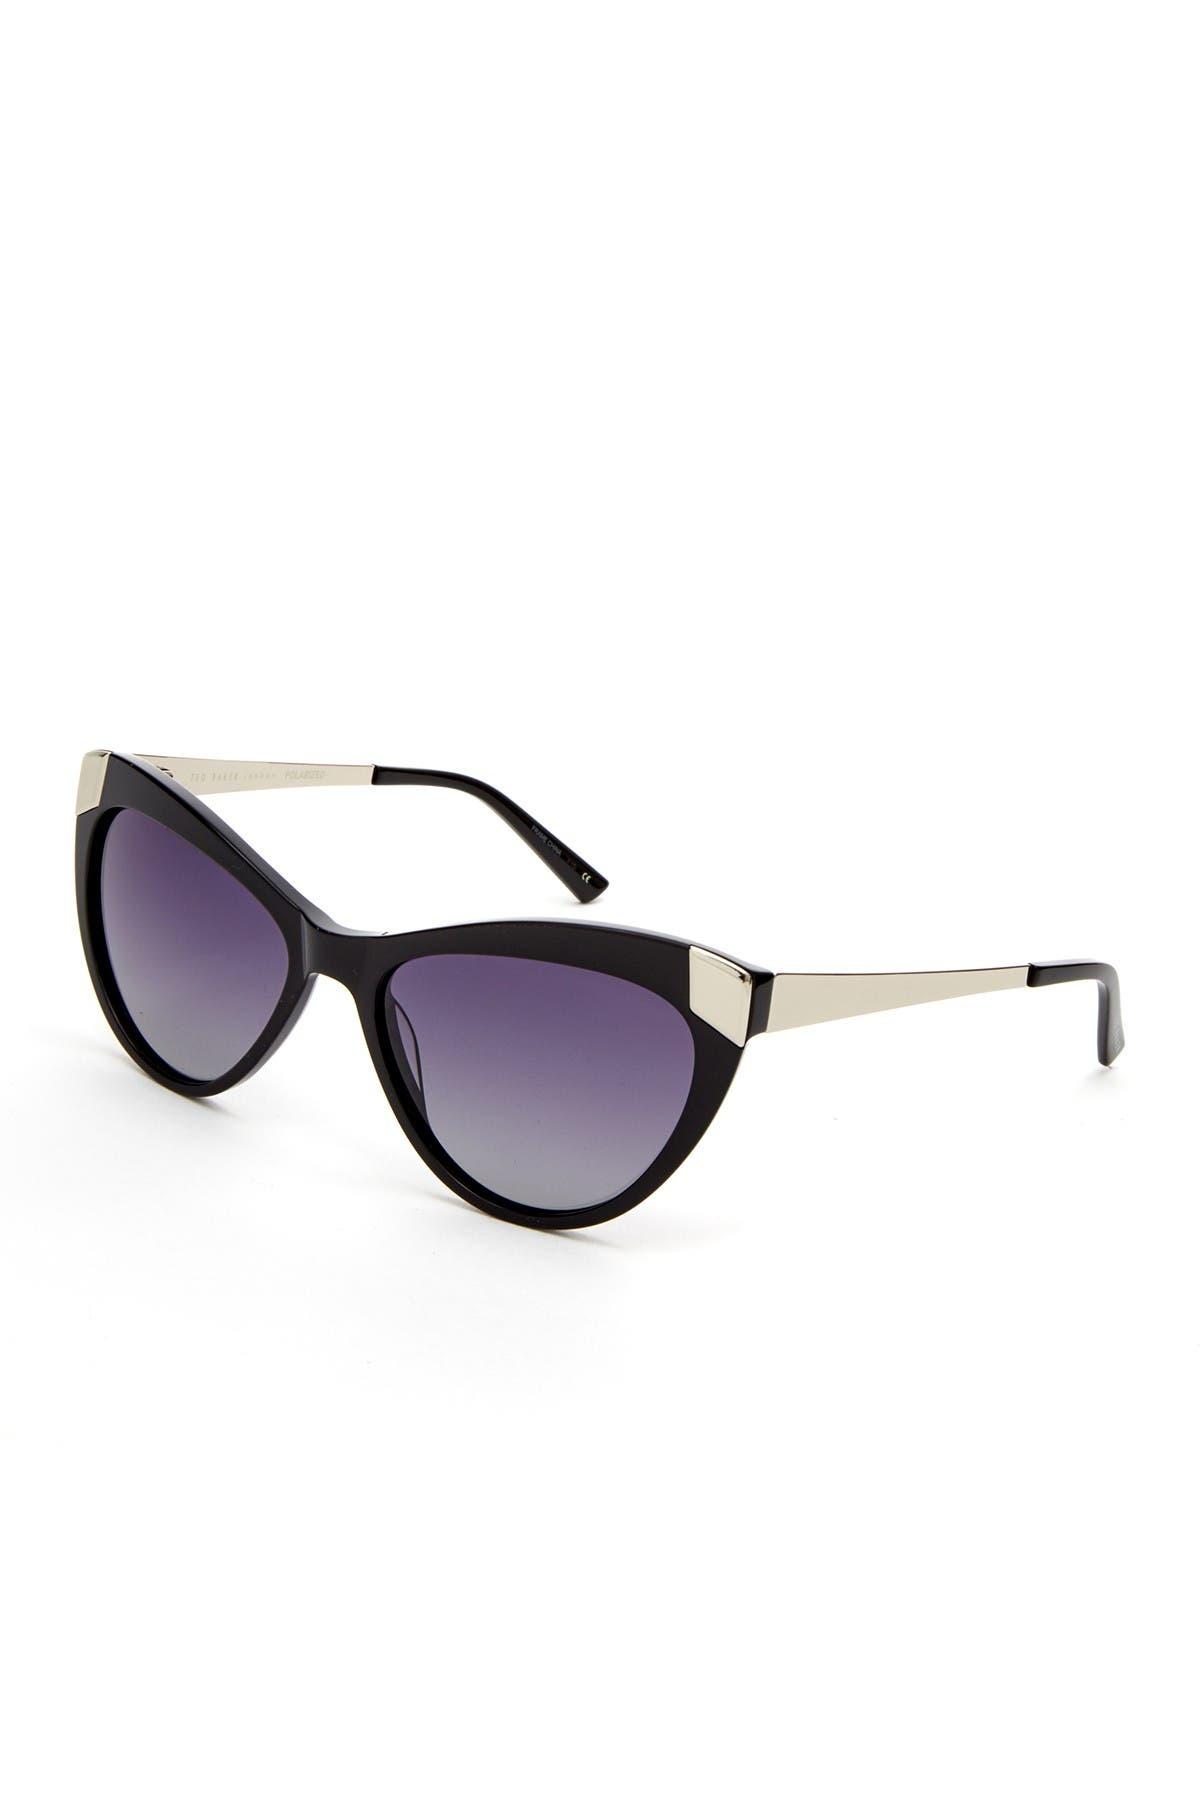 Image of Ted Baker London 54mm Plastic Round Cat Eye Sunglasses